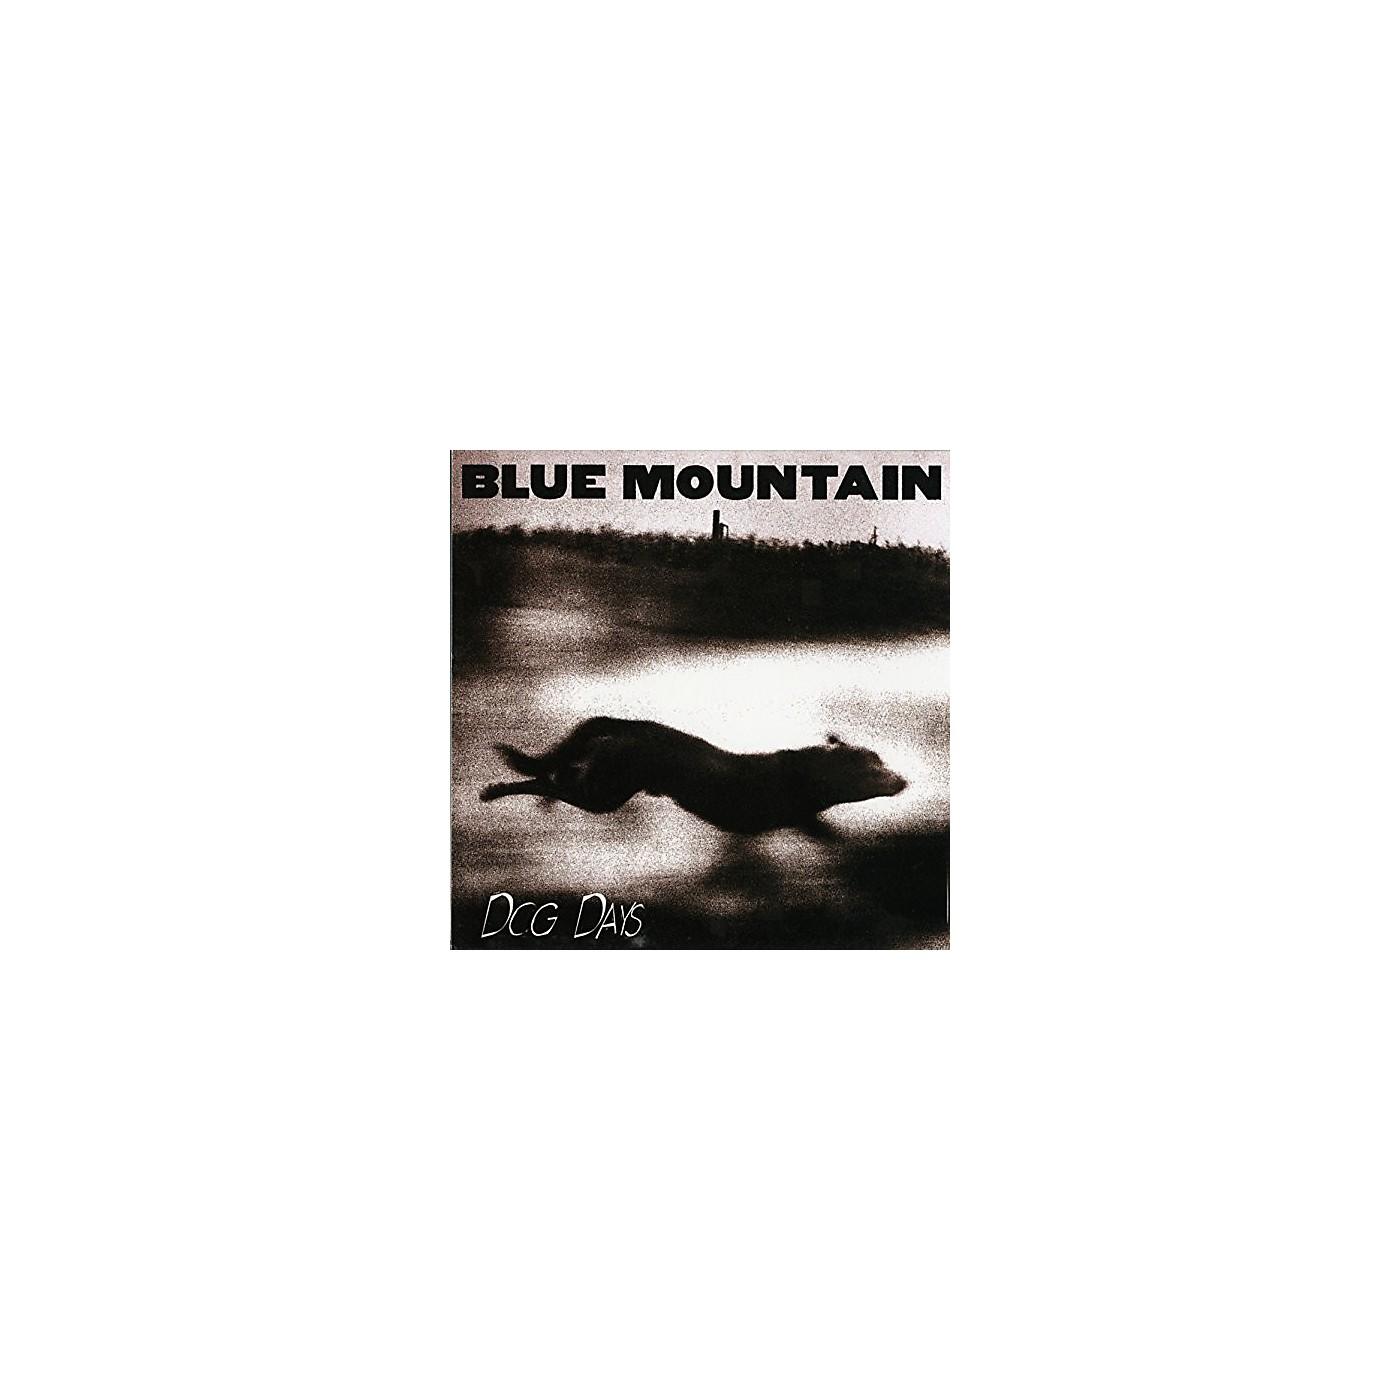 Alliance Blue Mountain - Dog Days thumbnail